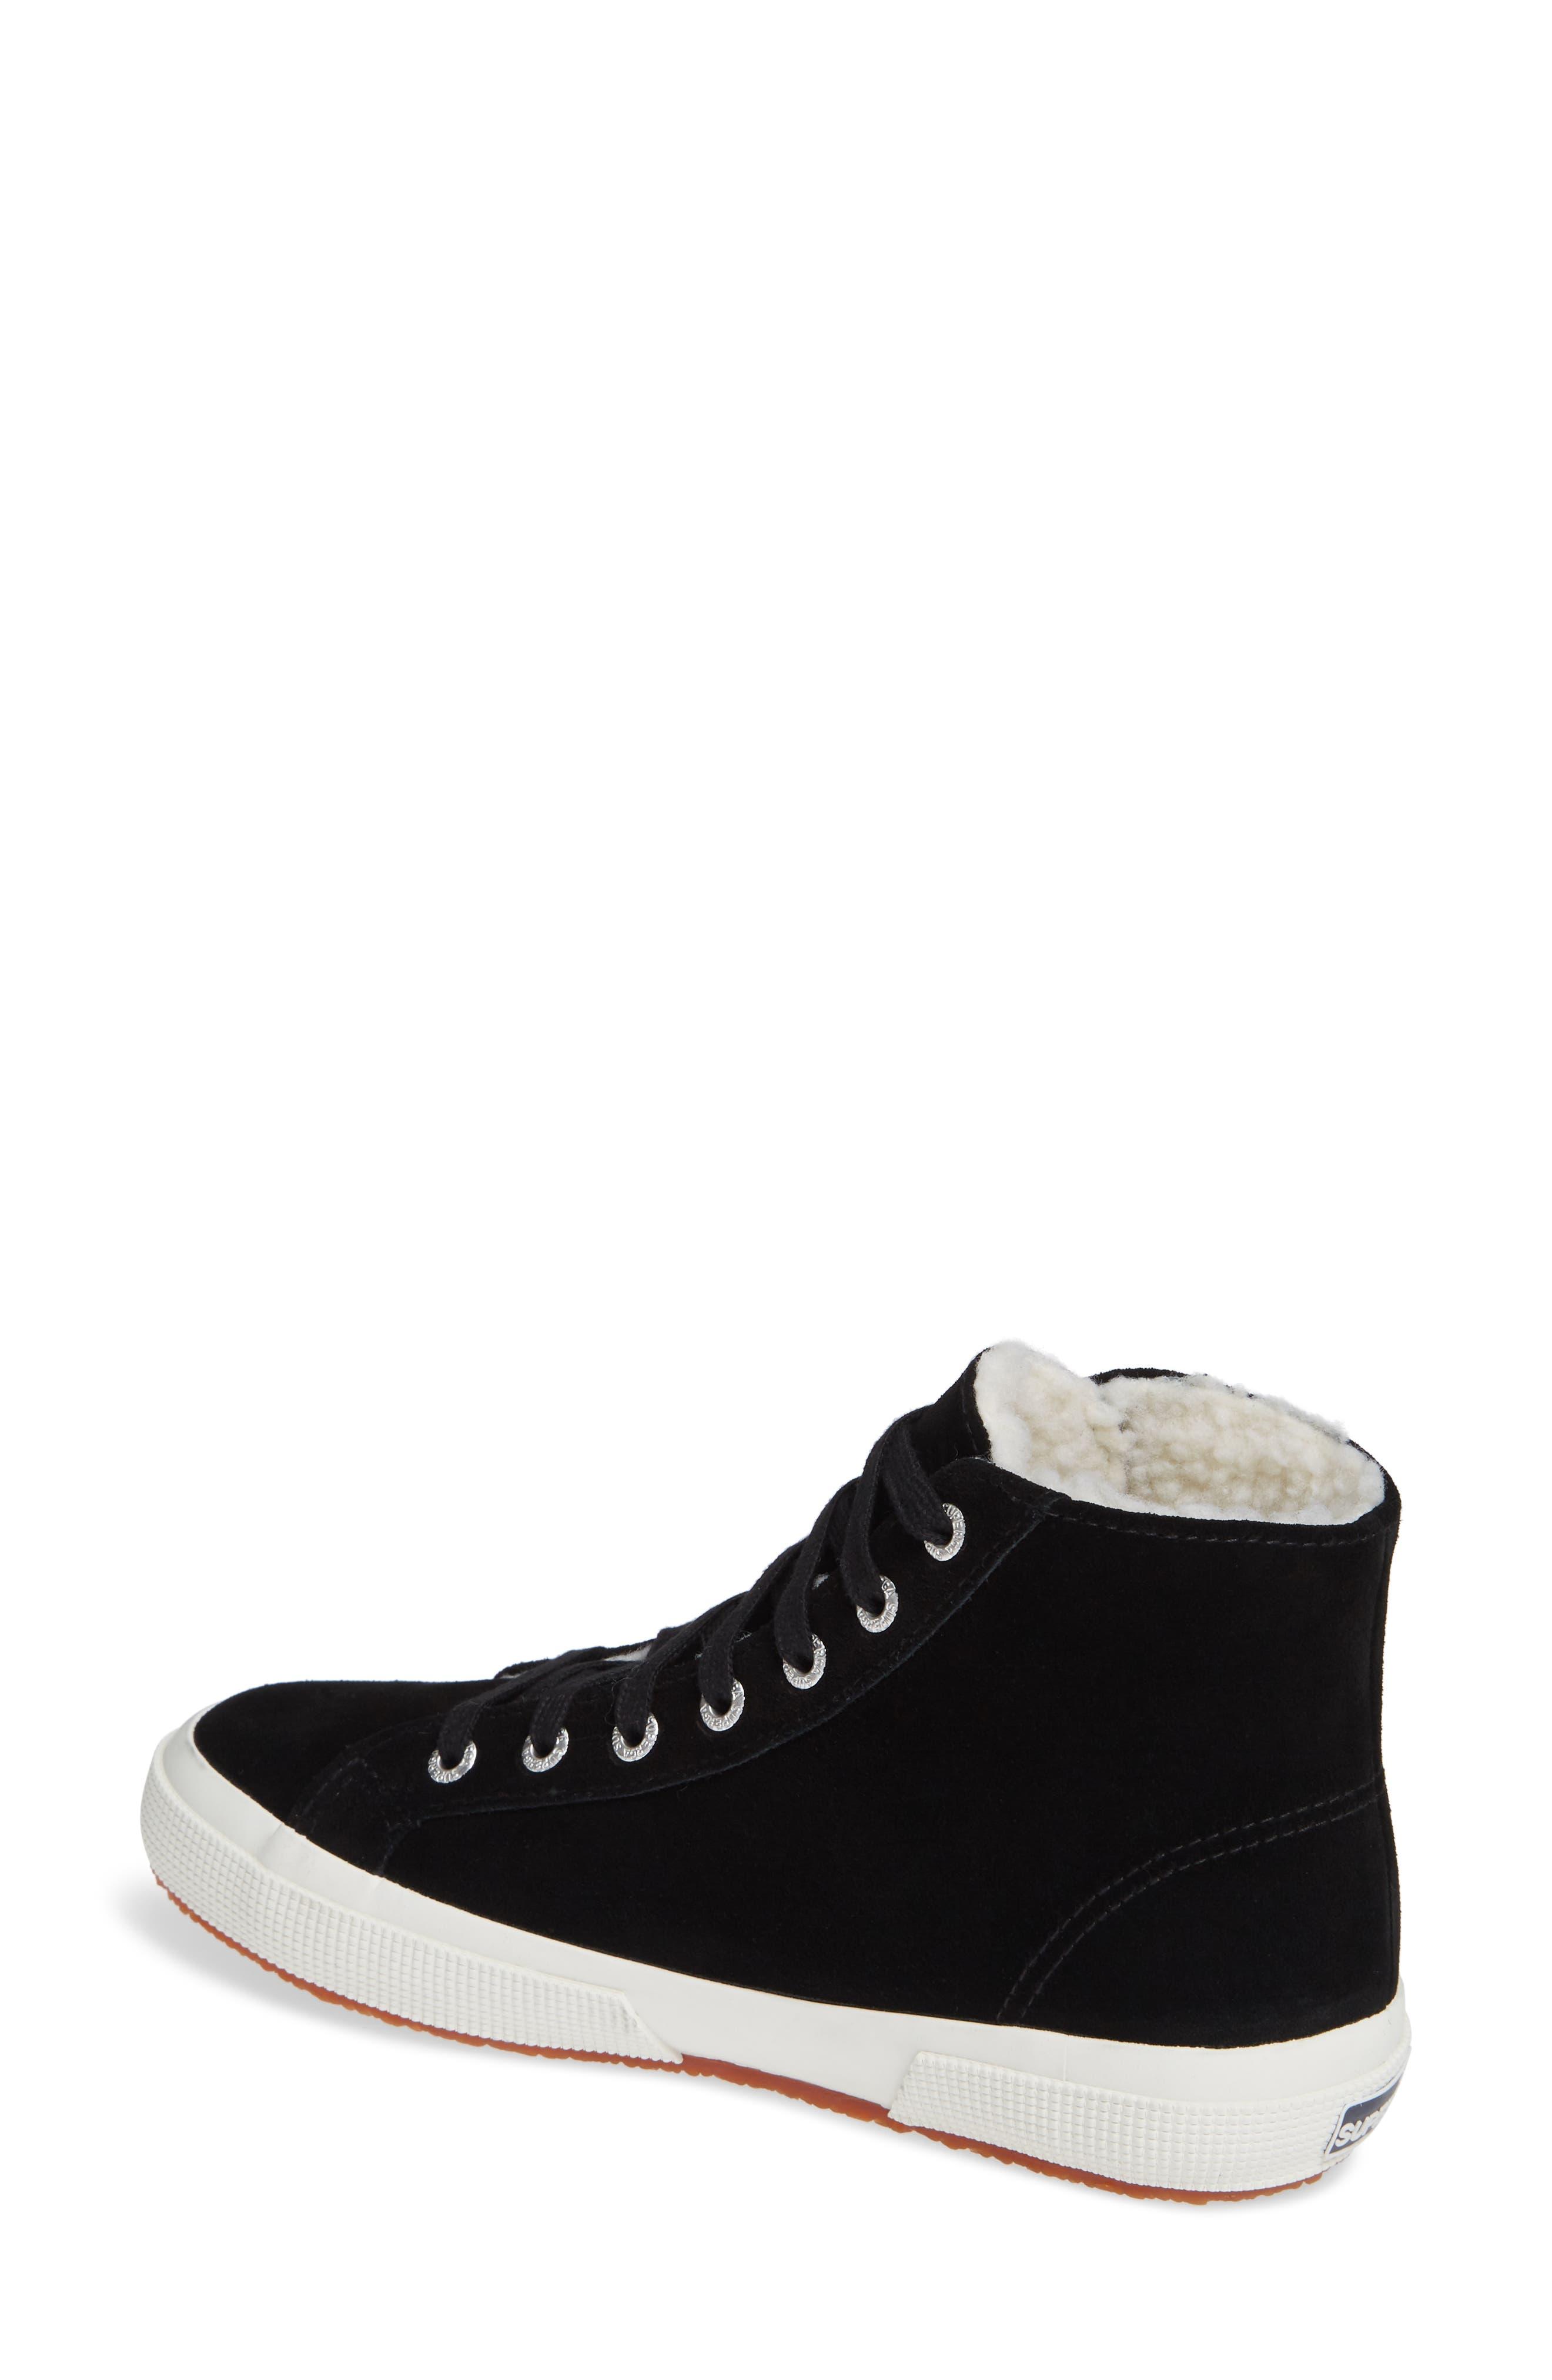 2795 Suefurw High Top Sneaker,                             Alternate thumbnail 2, color,                             BLACK SUEDE